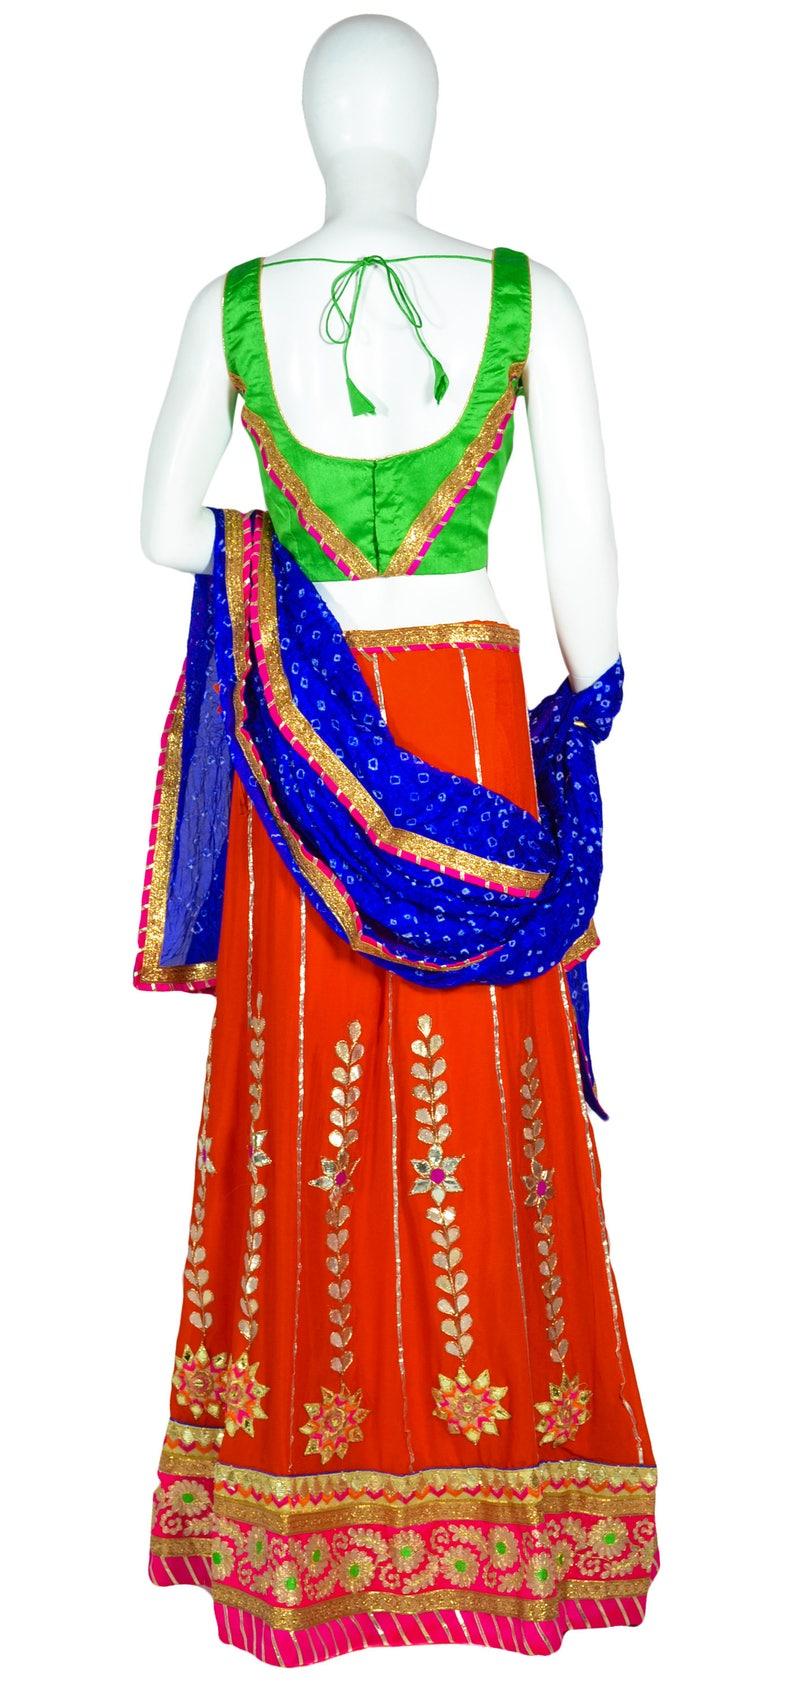 Indian Orange Crepe Silk Lehenga with Gota Patti work and Pink border Blue Bandhini Dupatta and Green Blouse for Navratri